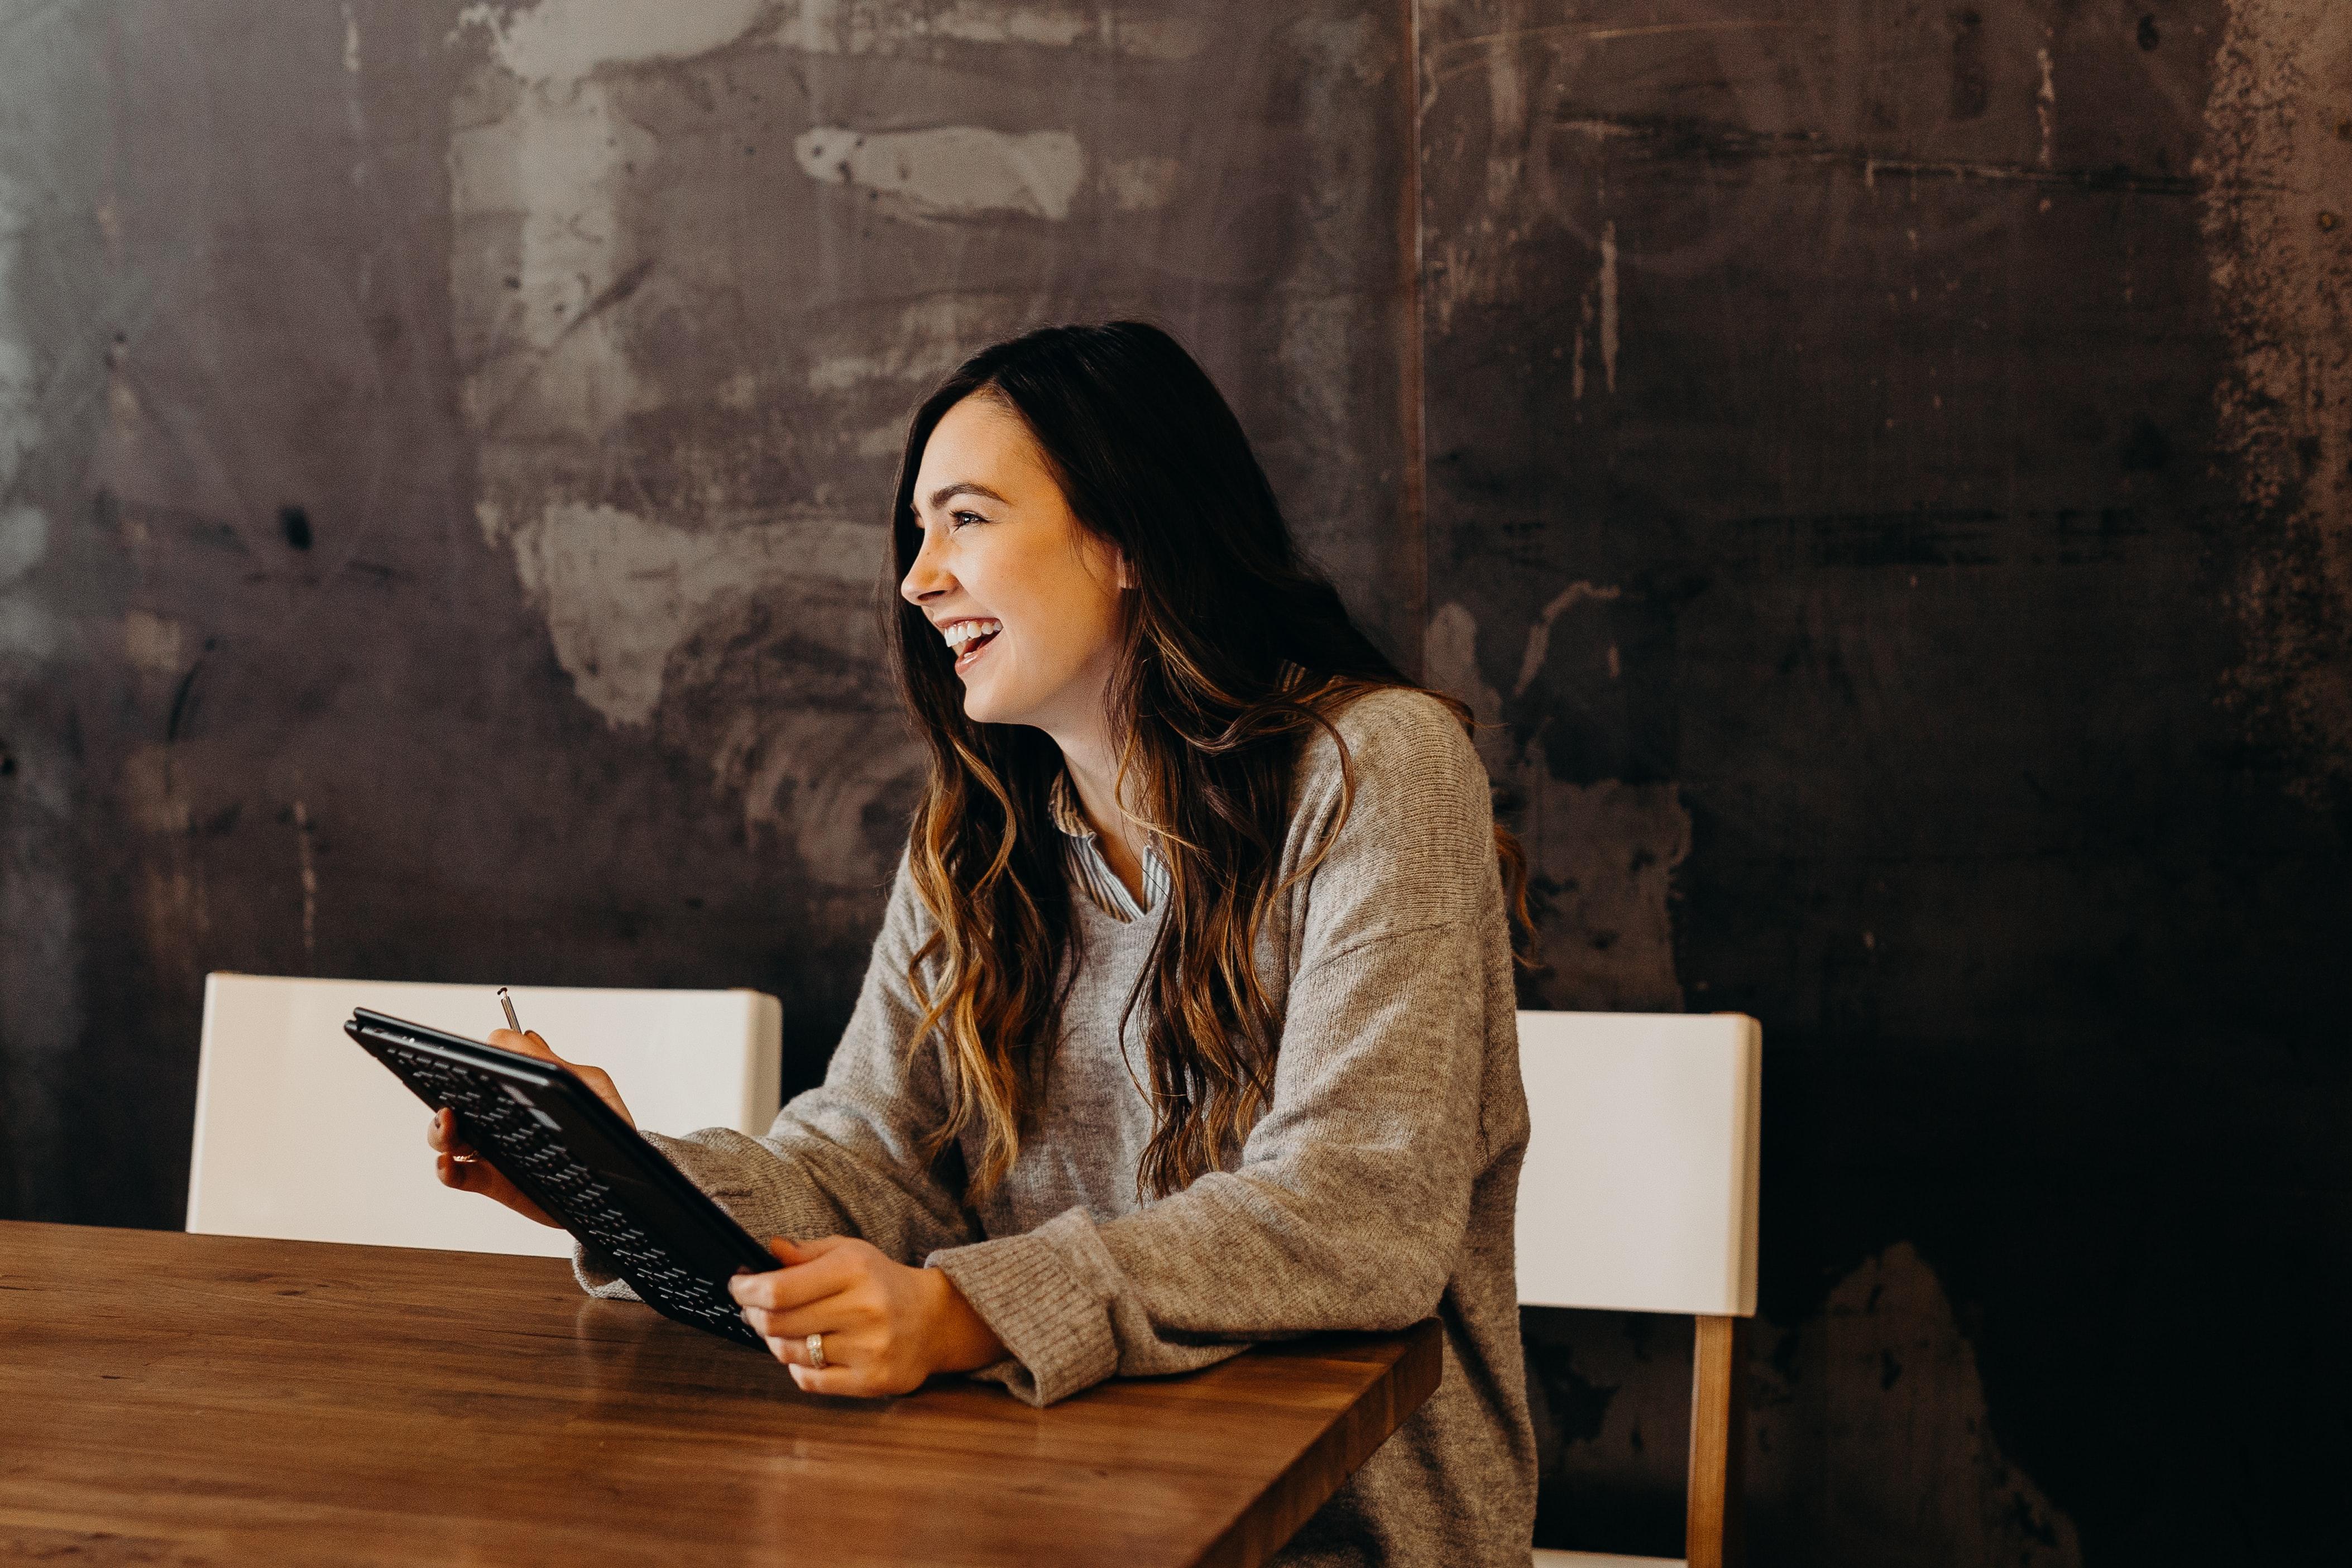 A girl smiling looking at an ipad